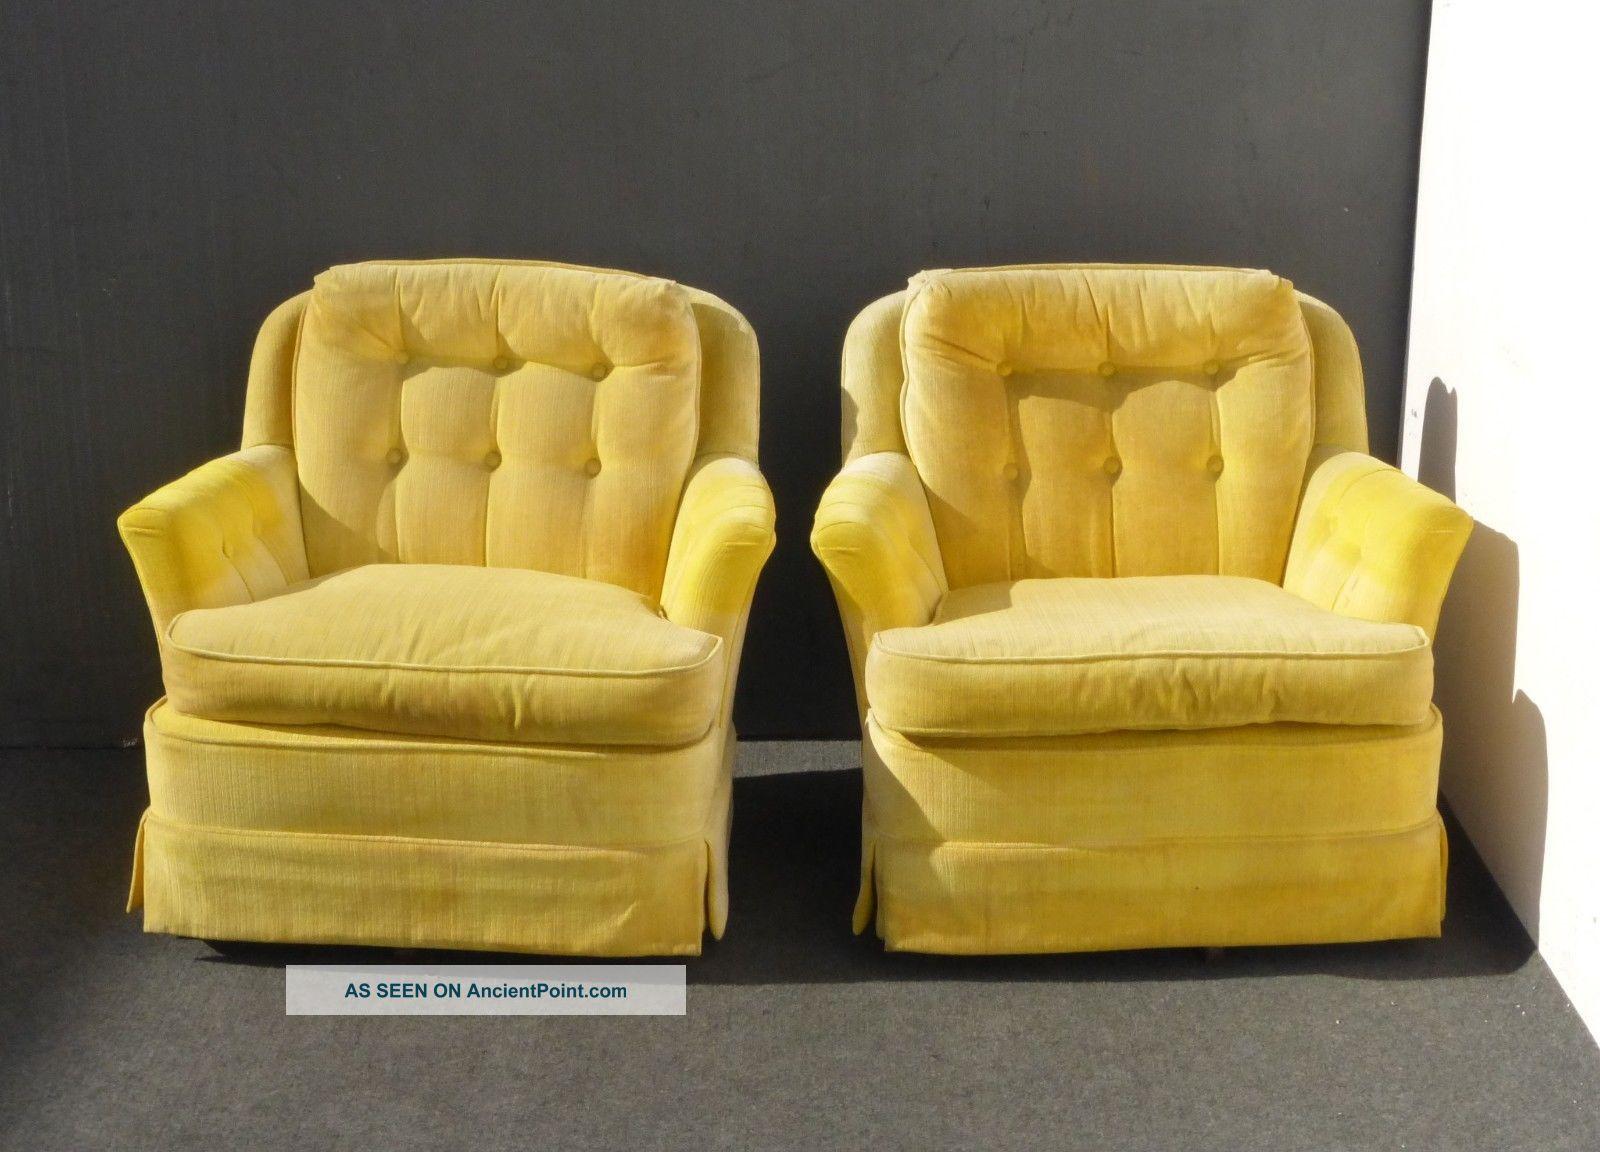 Marge Carson Bedroom Furniture Similiar Marge Carson Craigslist 2015 Keywords